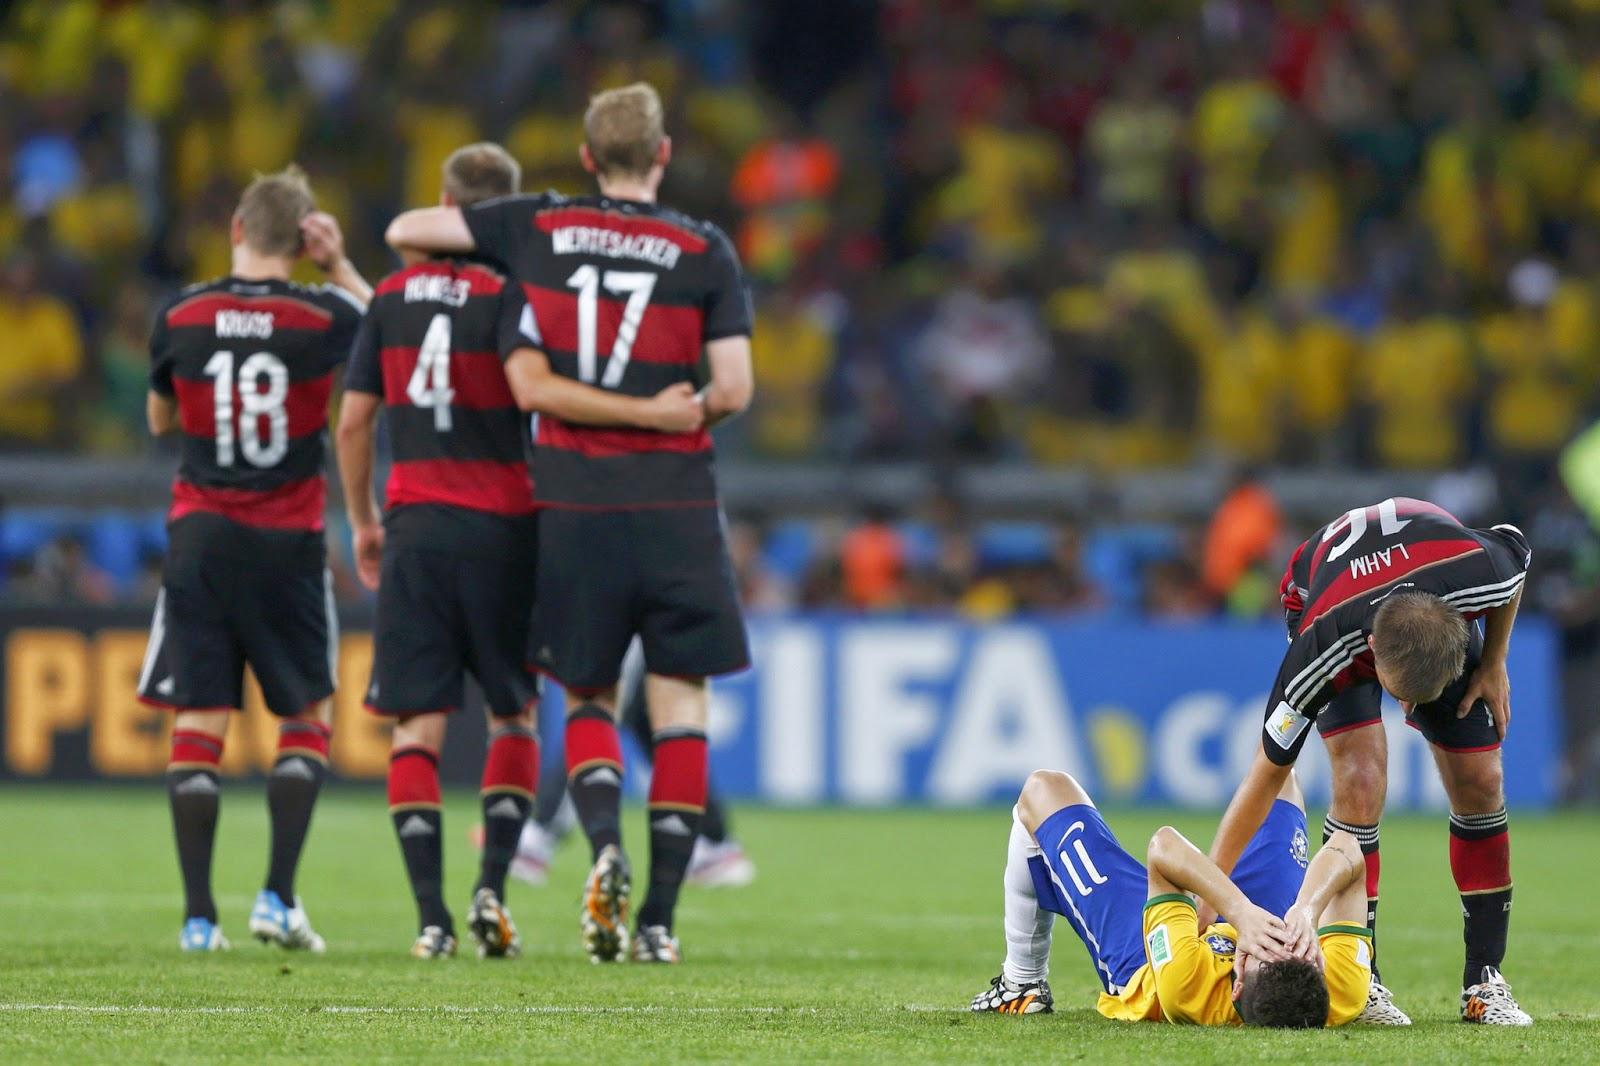 Pemain Jerman Philipp Lahml tampak sedang menghibur Pemain Brasil Oscar yang tengah sedih. Kredit Marcos Brindicci/ReutersPress Via nytimes.com